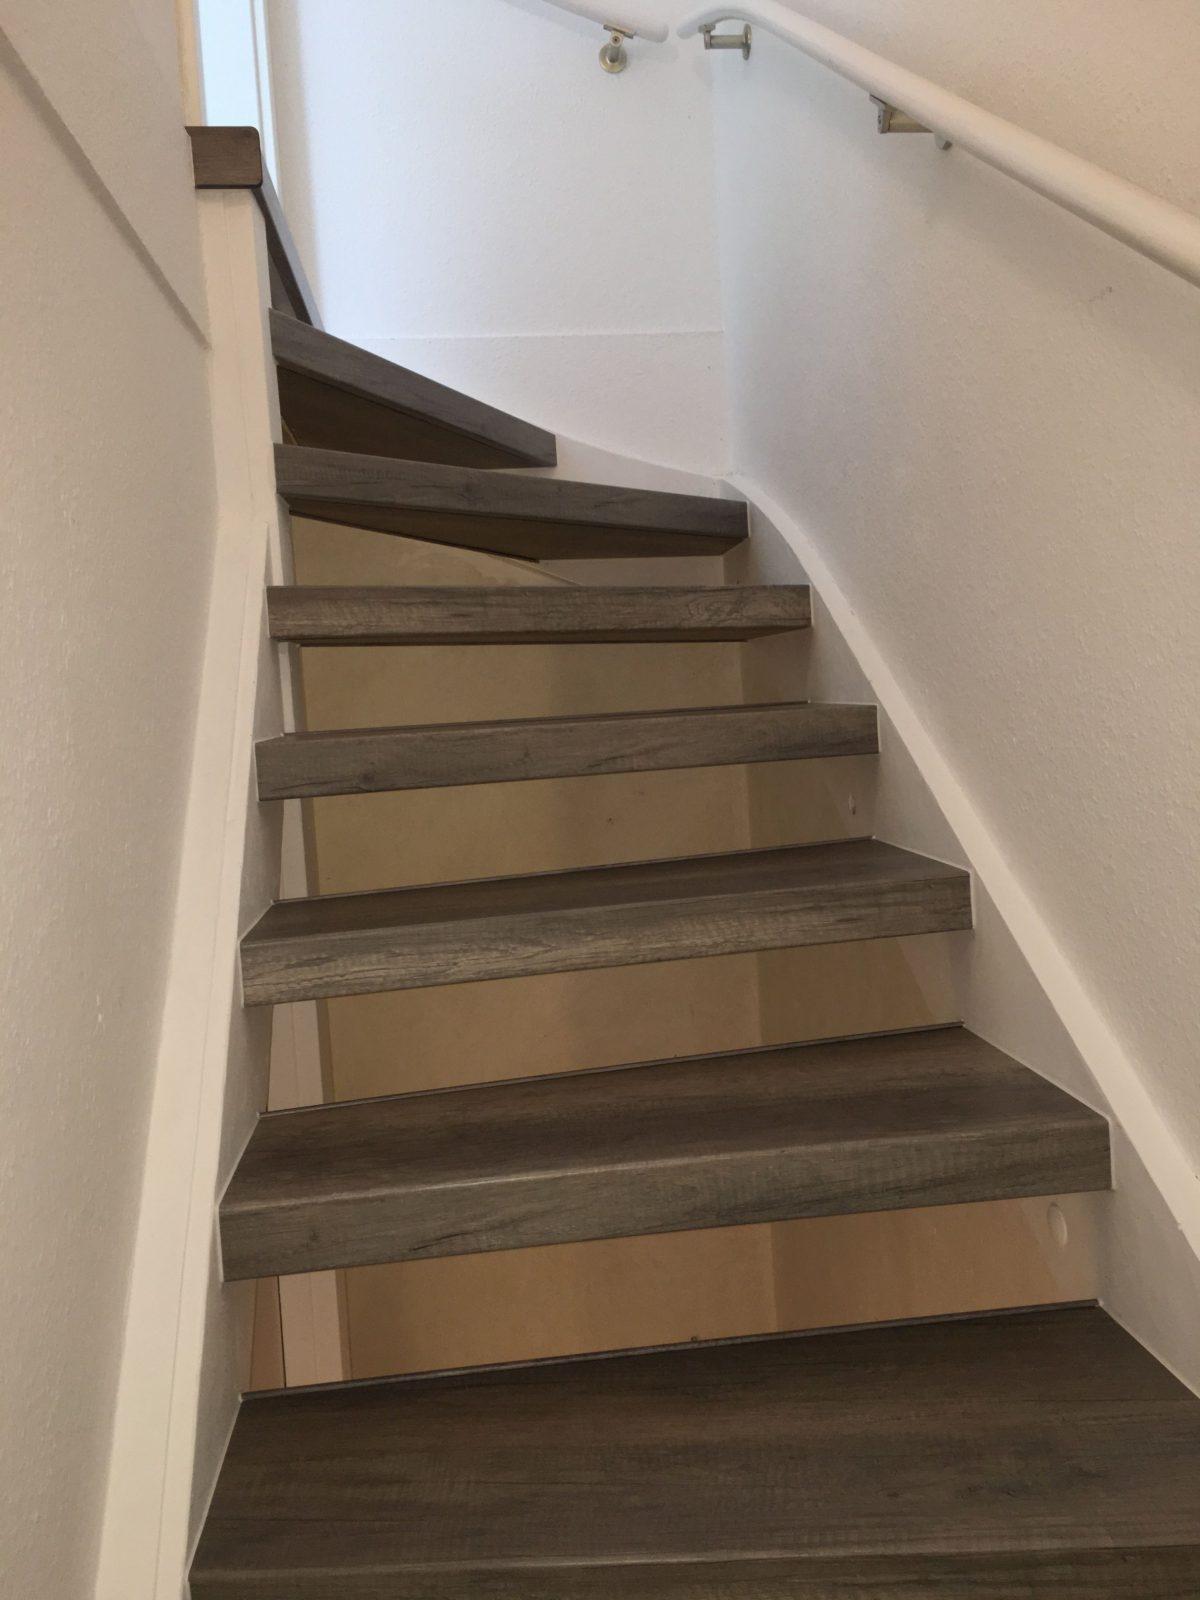 Offene Treppen Neu Gestalten  Alte Treppe Neu Gestalten In 2019 von Altes Treppenhaus Neu Gestalten Bild